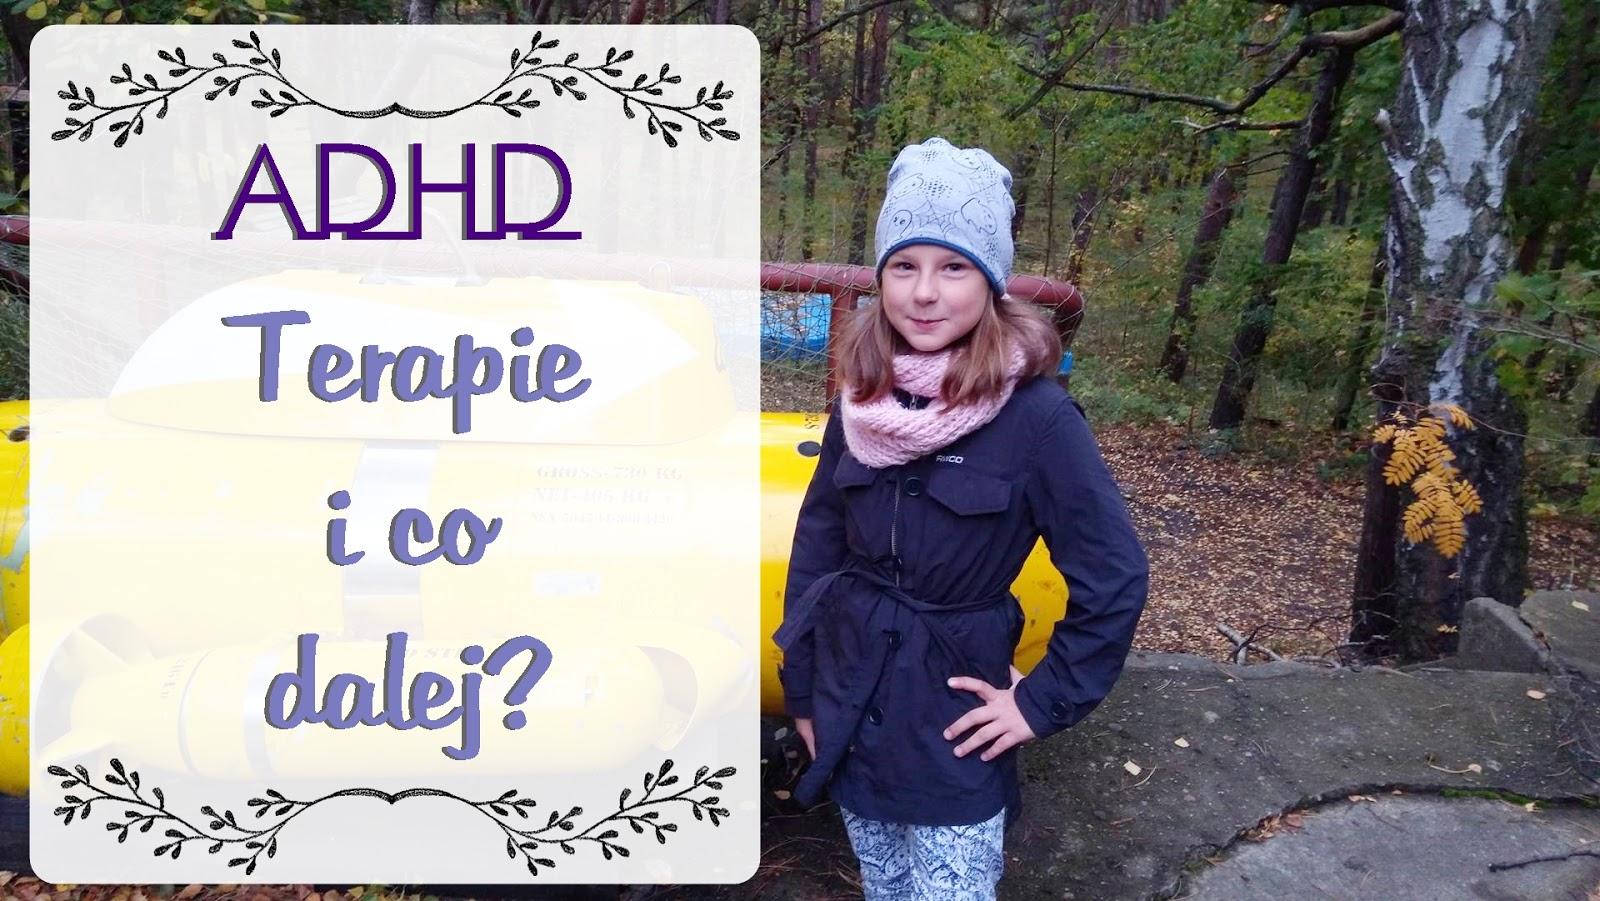 ADHD - terapie i co dalej?